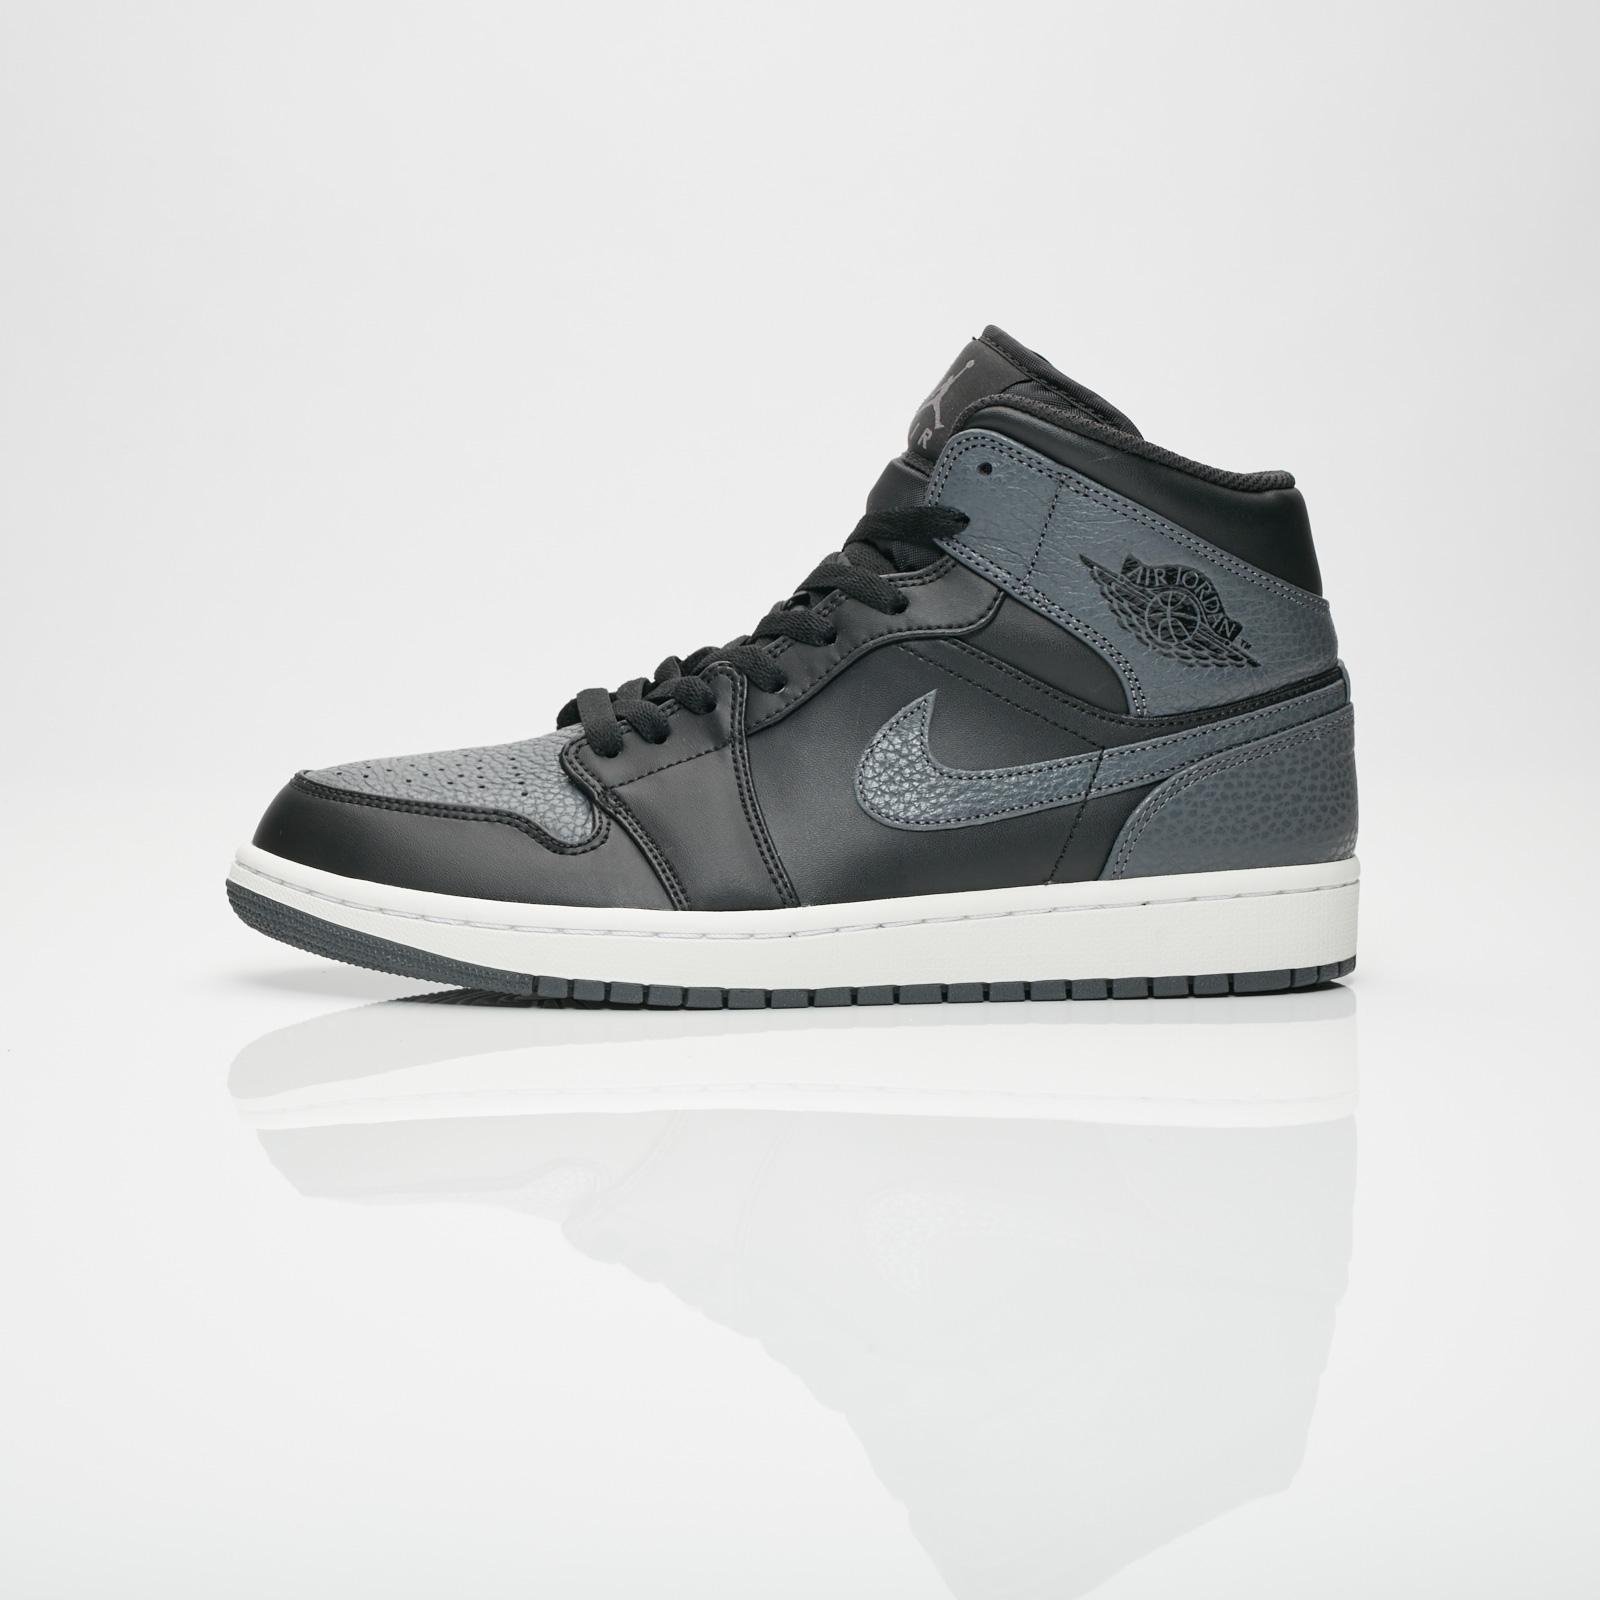 cfbd812abee5e6 Jordan Brand Air Jordan 1 Mid - 554724-041 - Sneakersnstuff ...